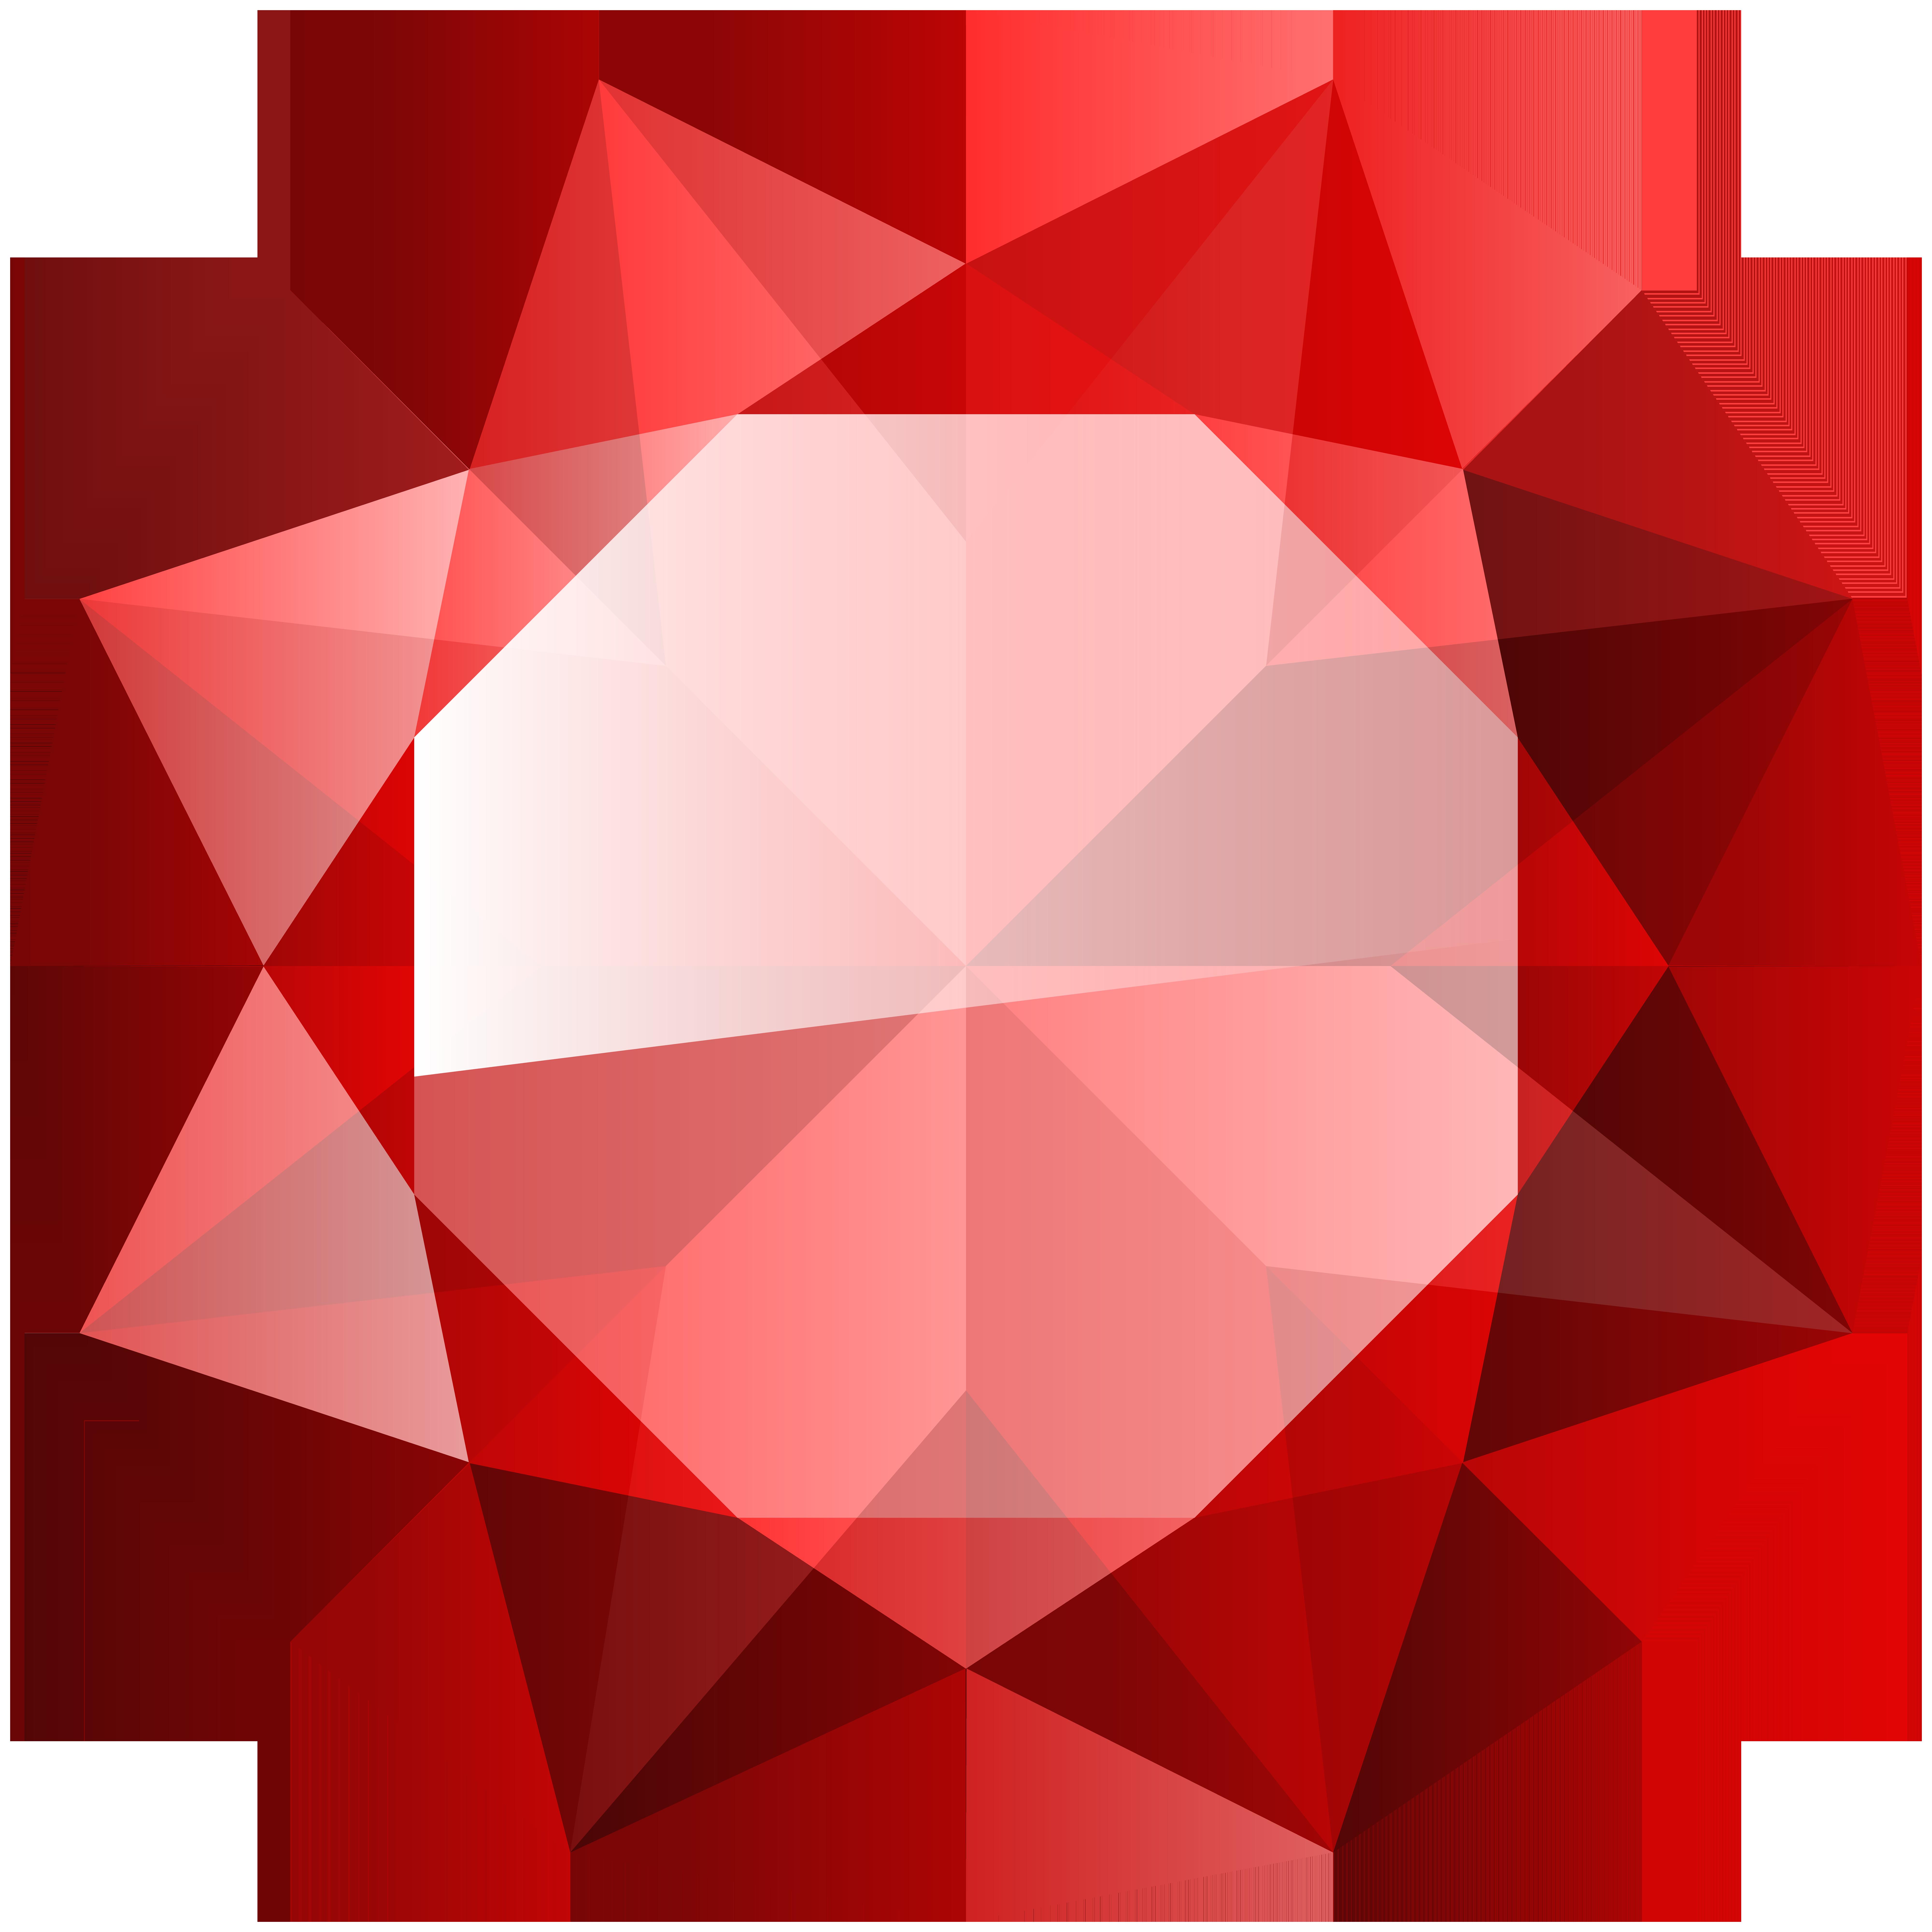 Diamond clipart red diamond. Mickey mouse clip art